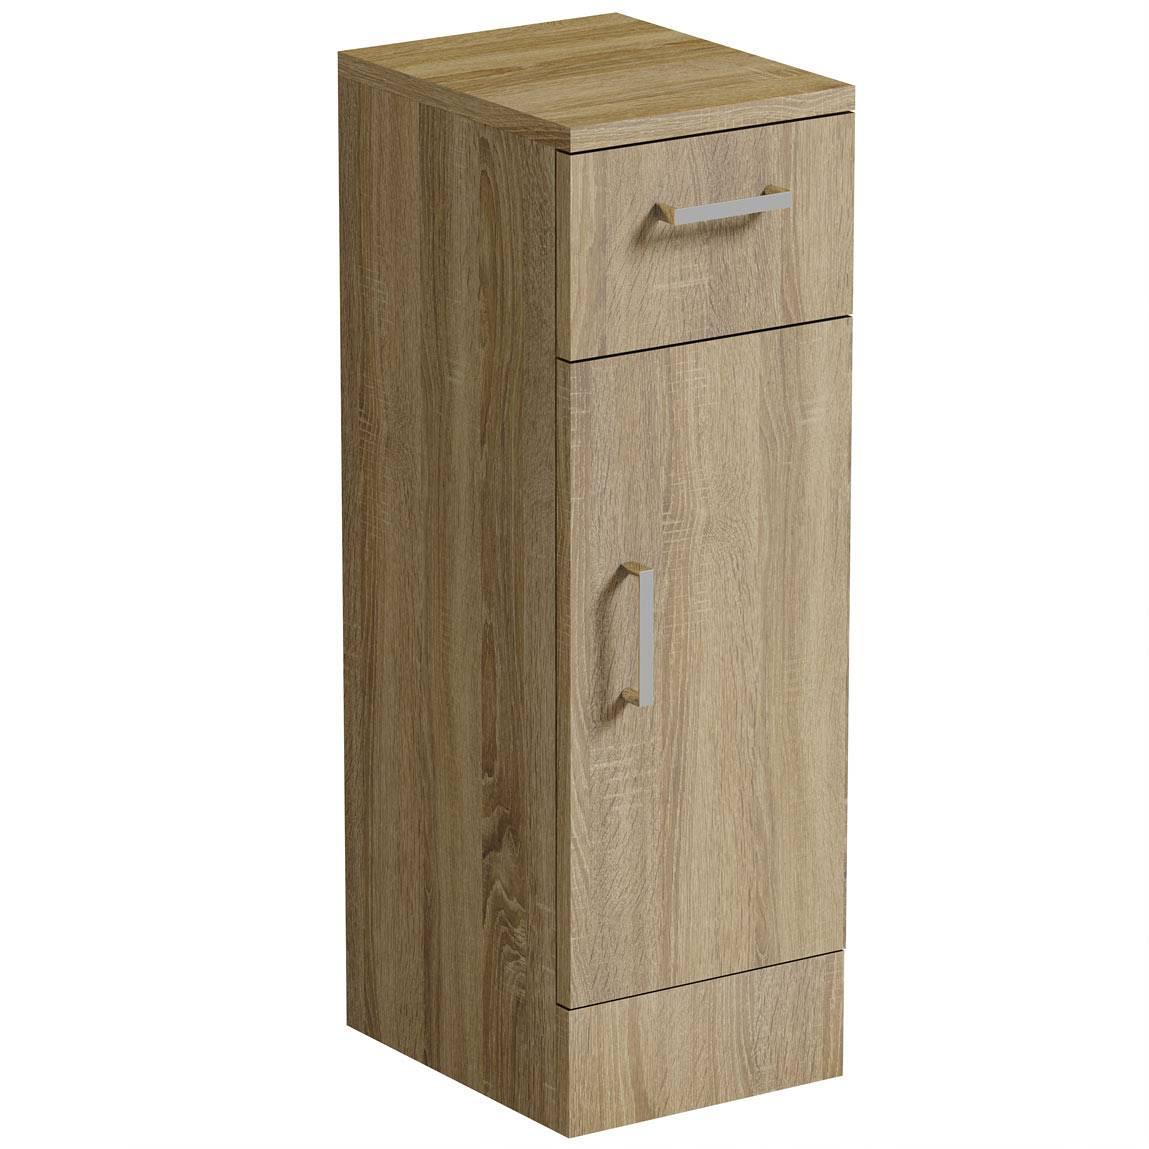 Image of Sienna Oak Storage Unit 300